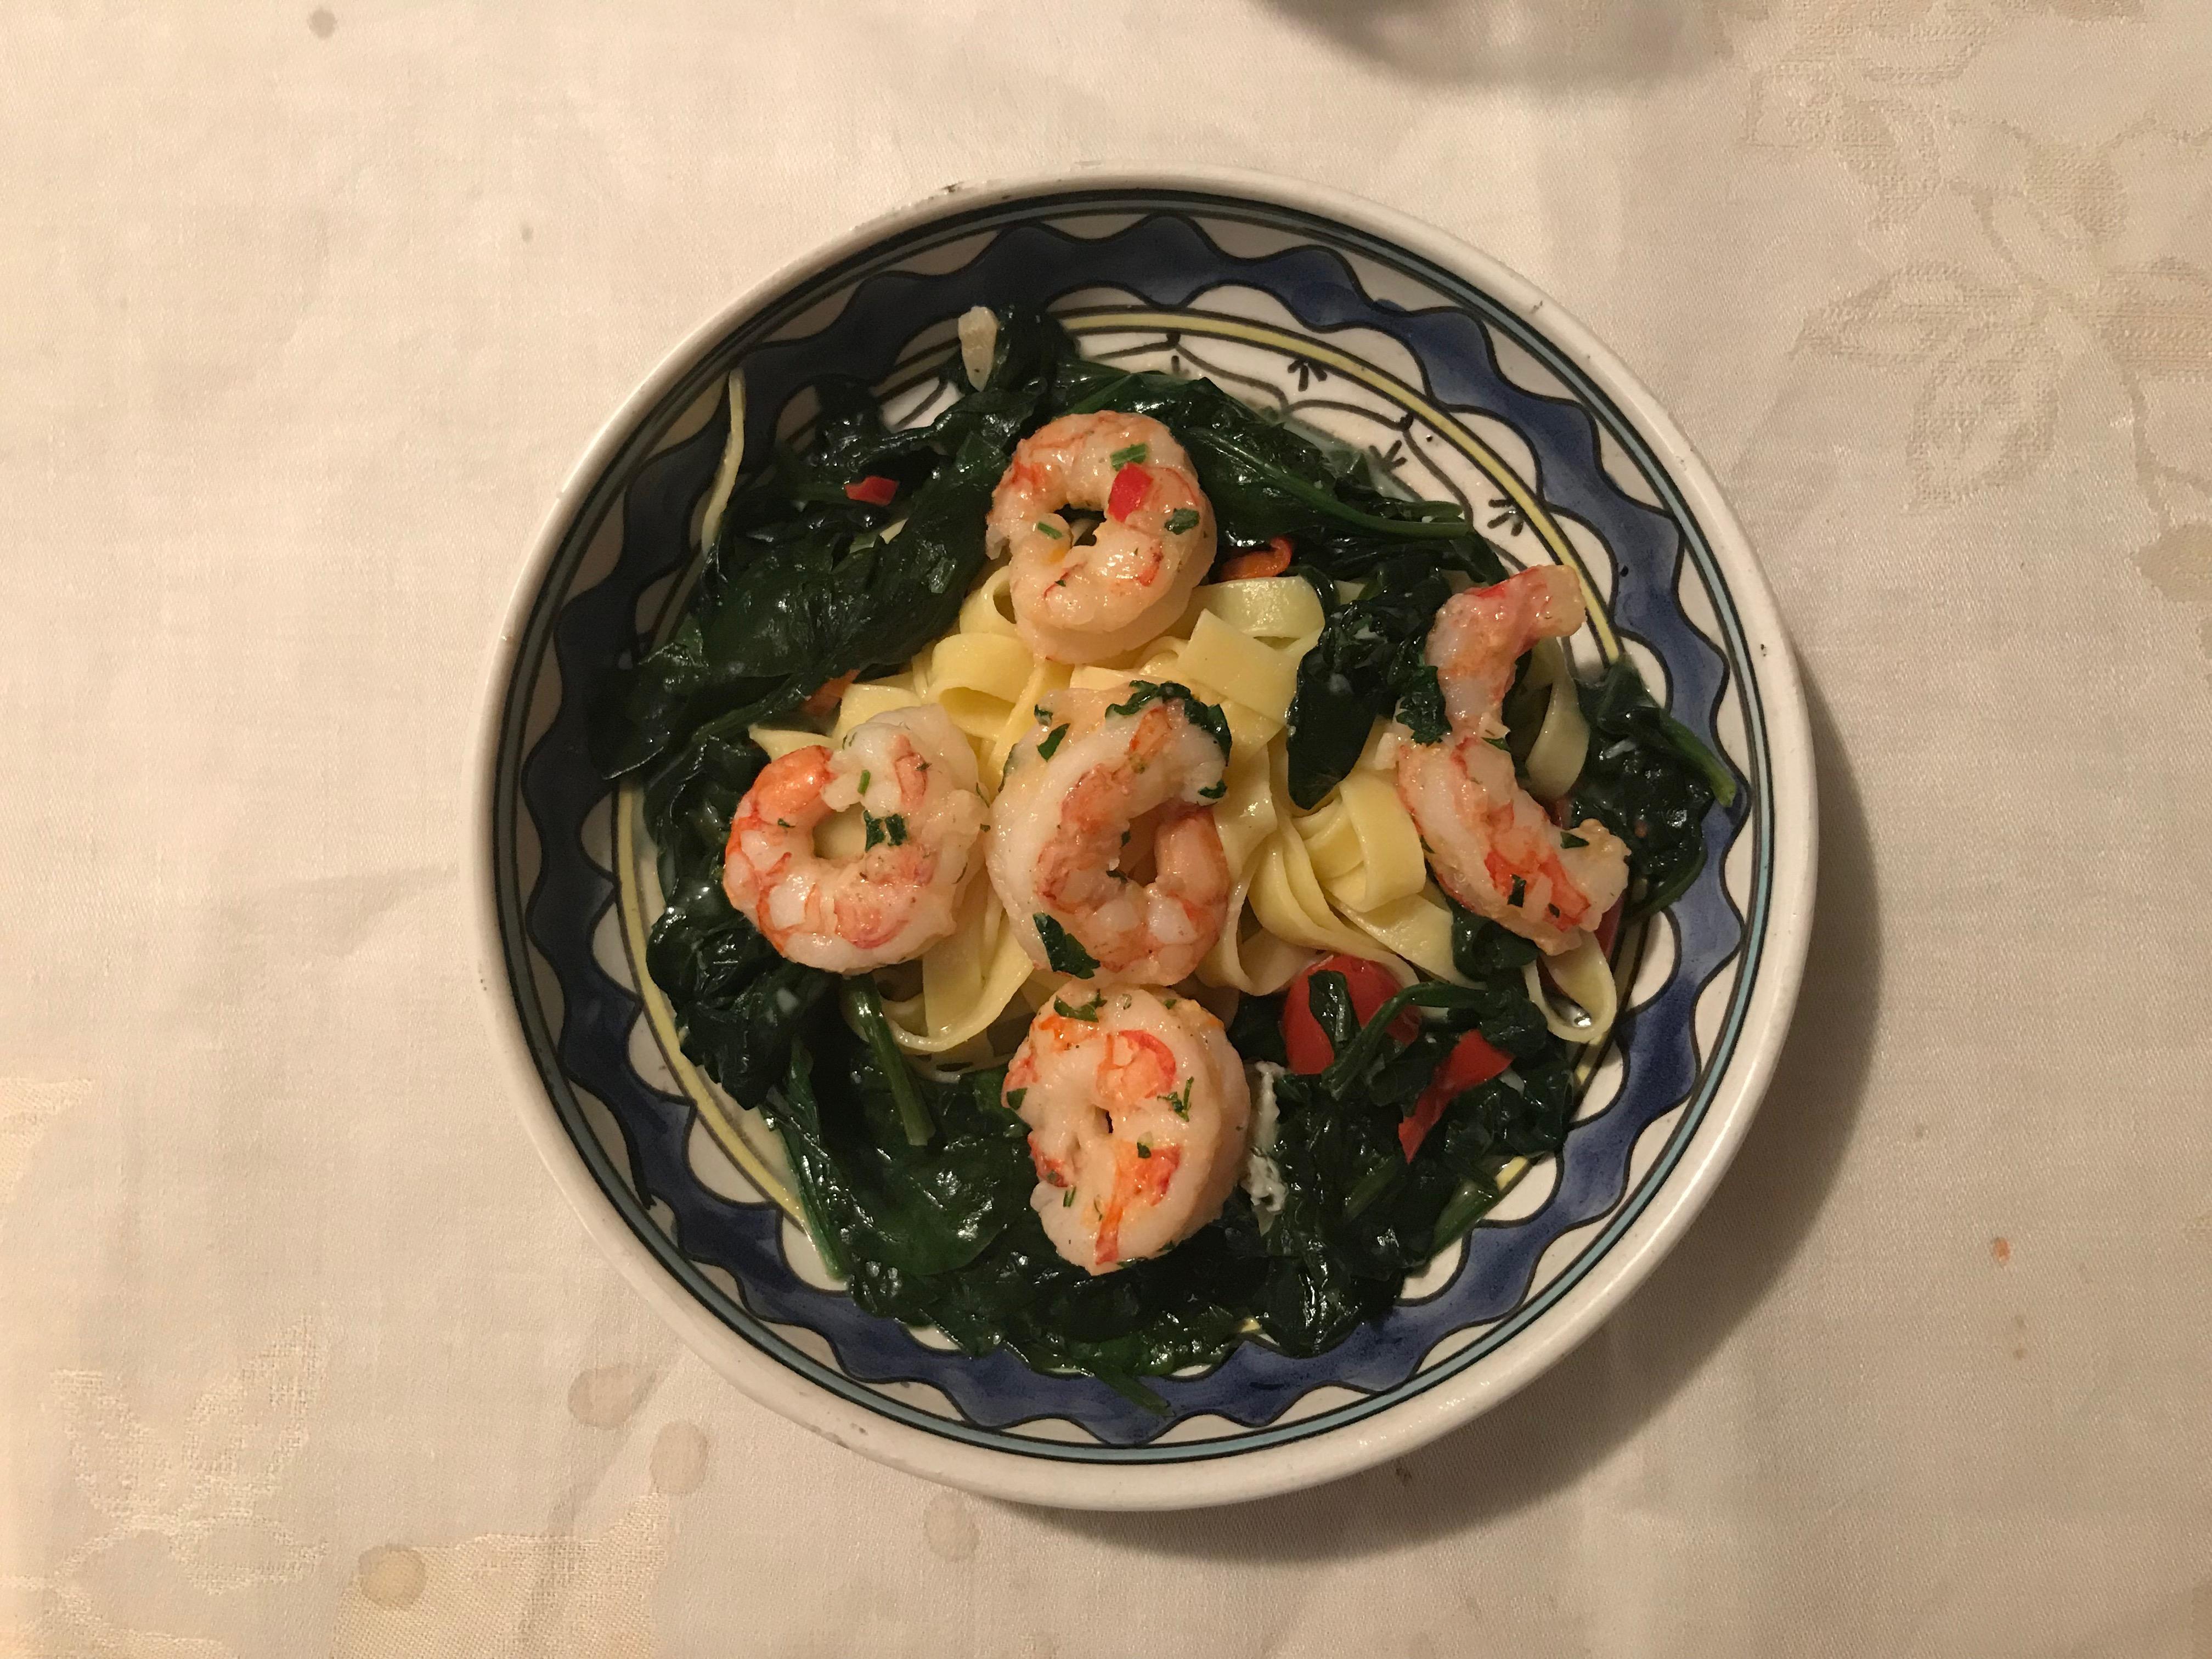 Gamba's, spinazie, witte wijn, gorgonzola pasta met rode peper.